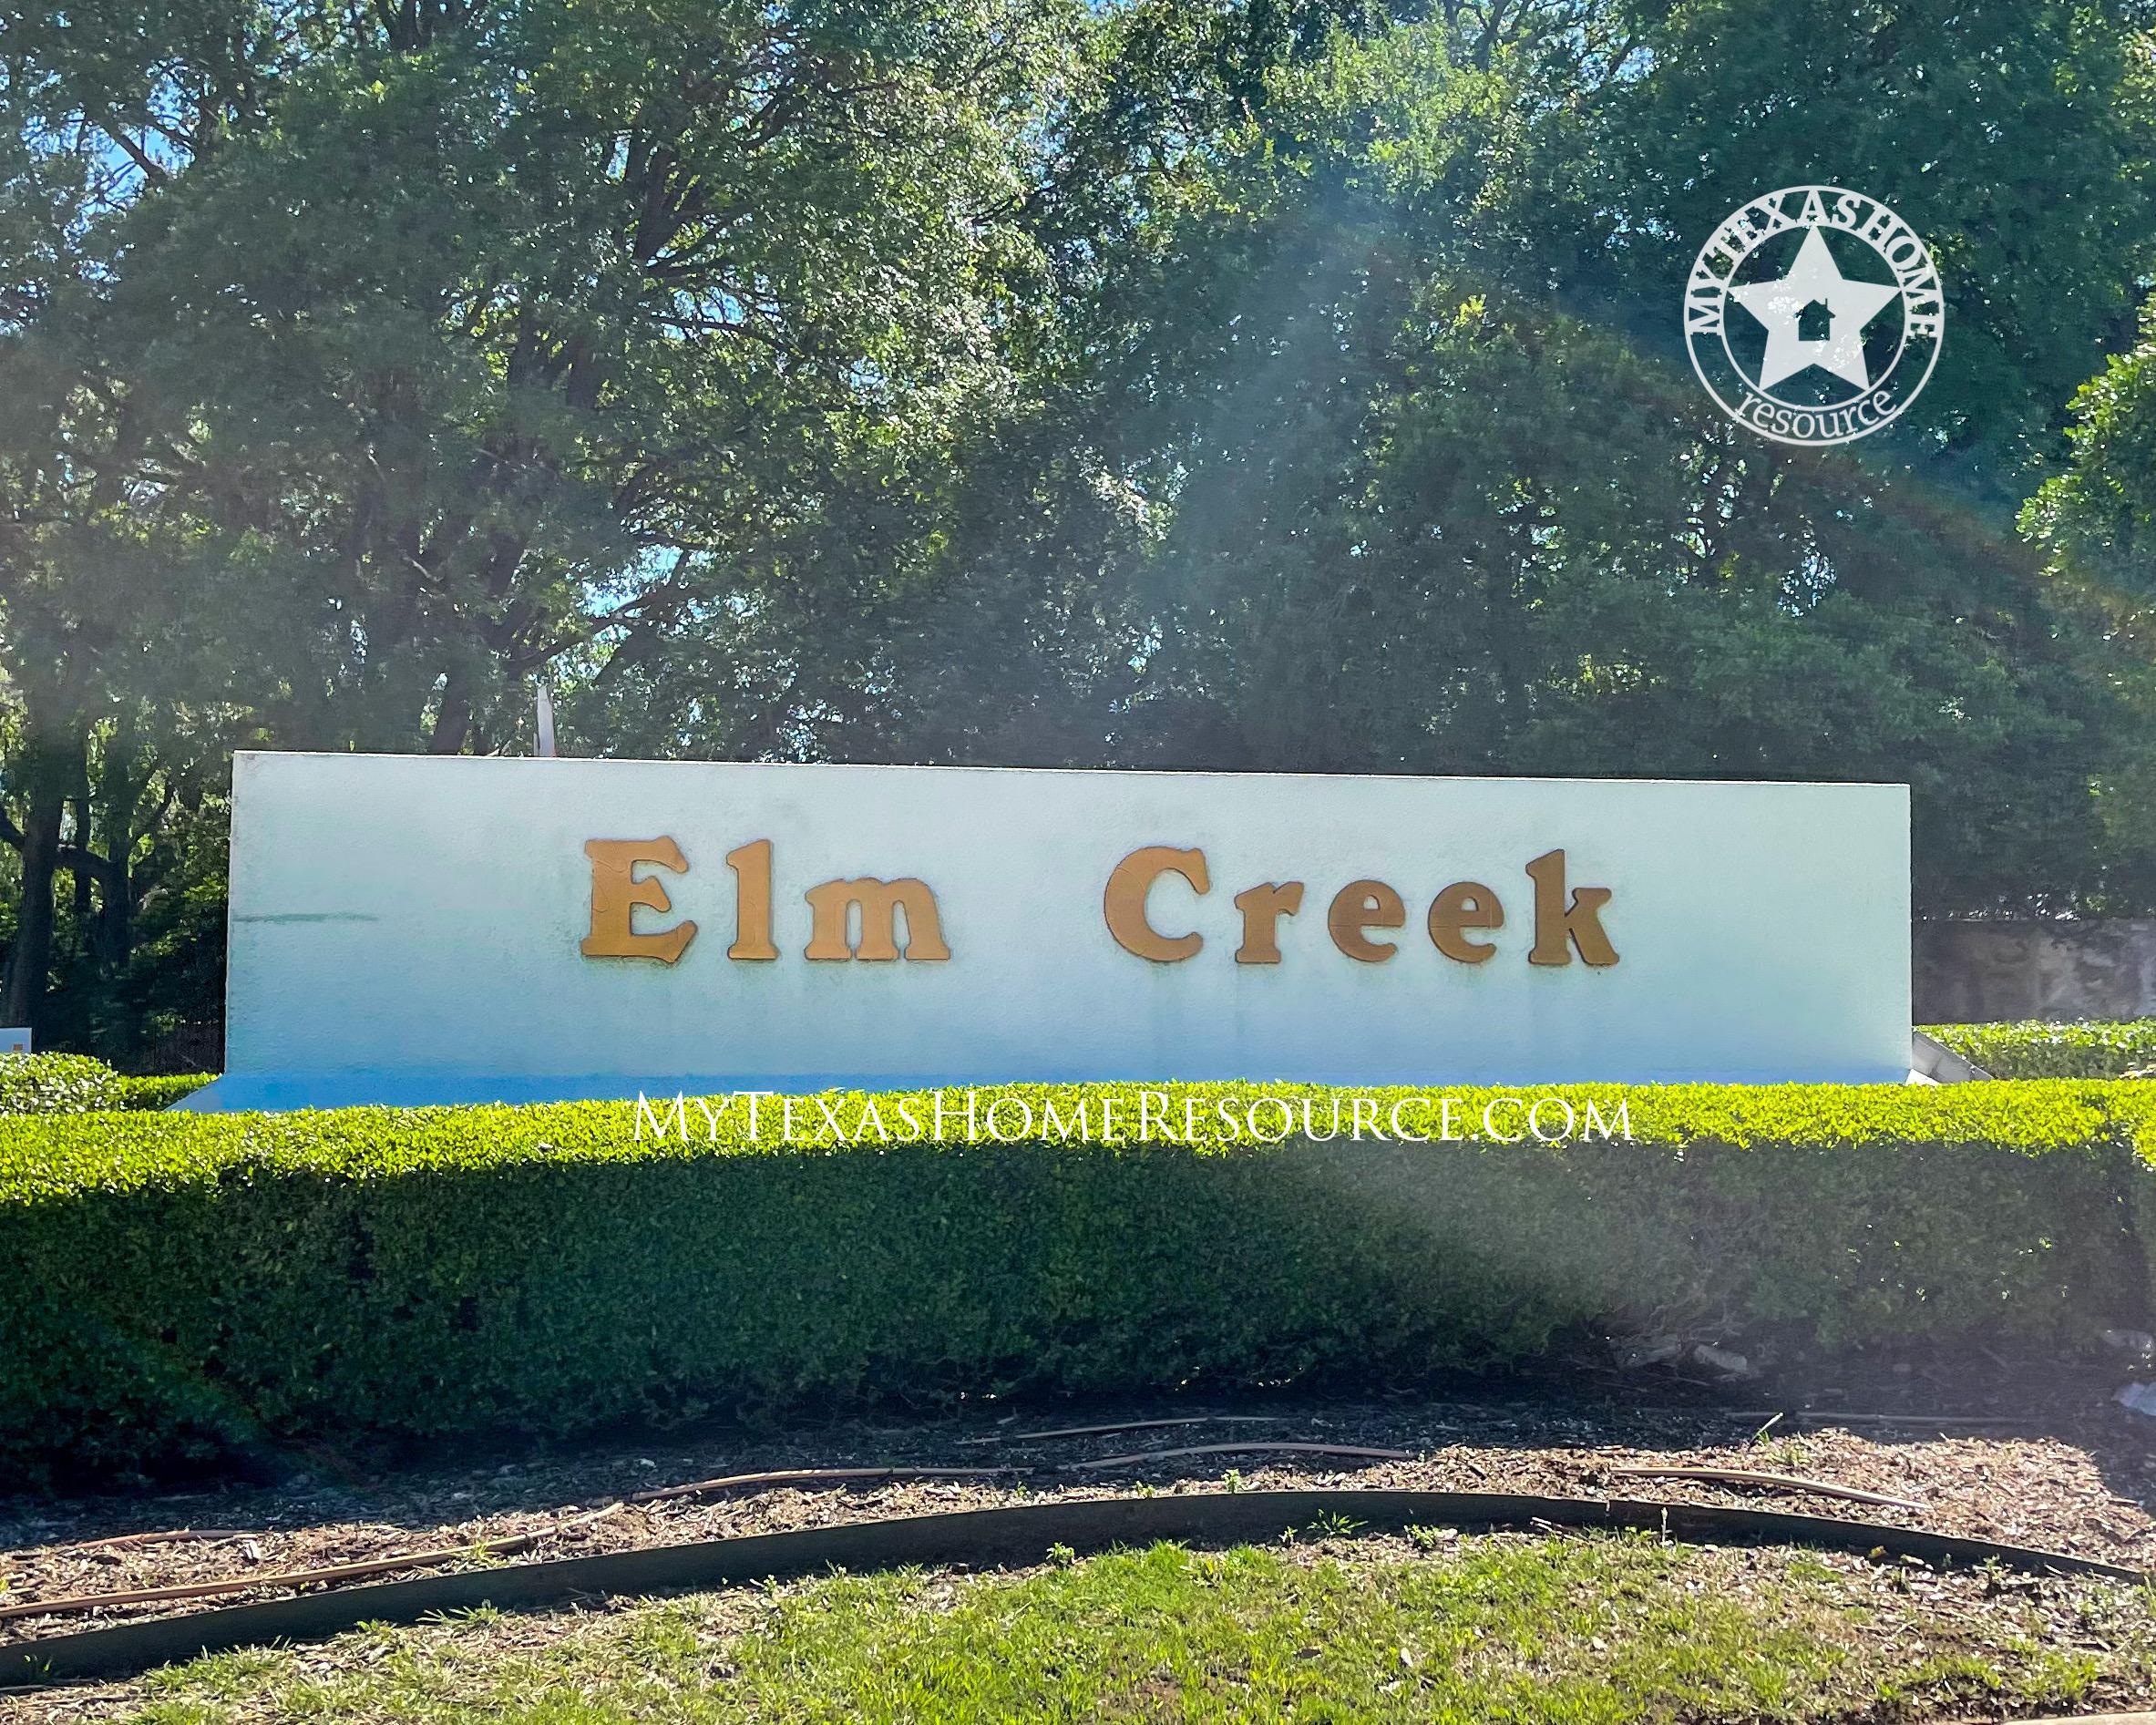 Elm Creek Community